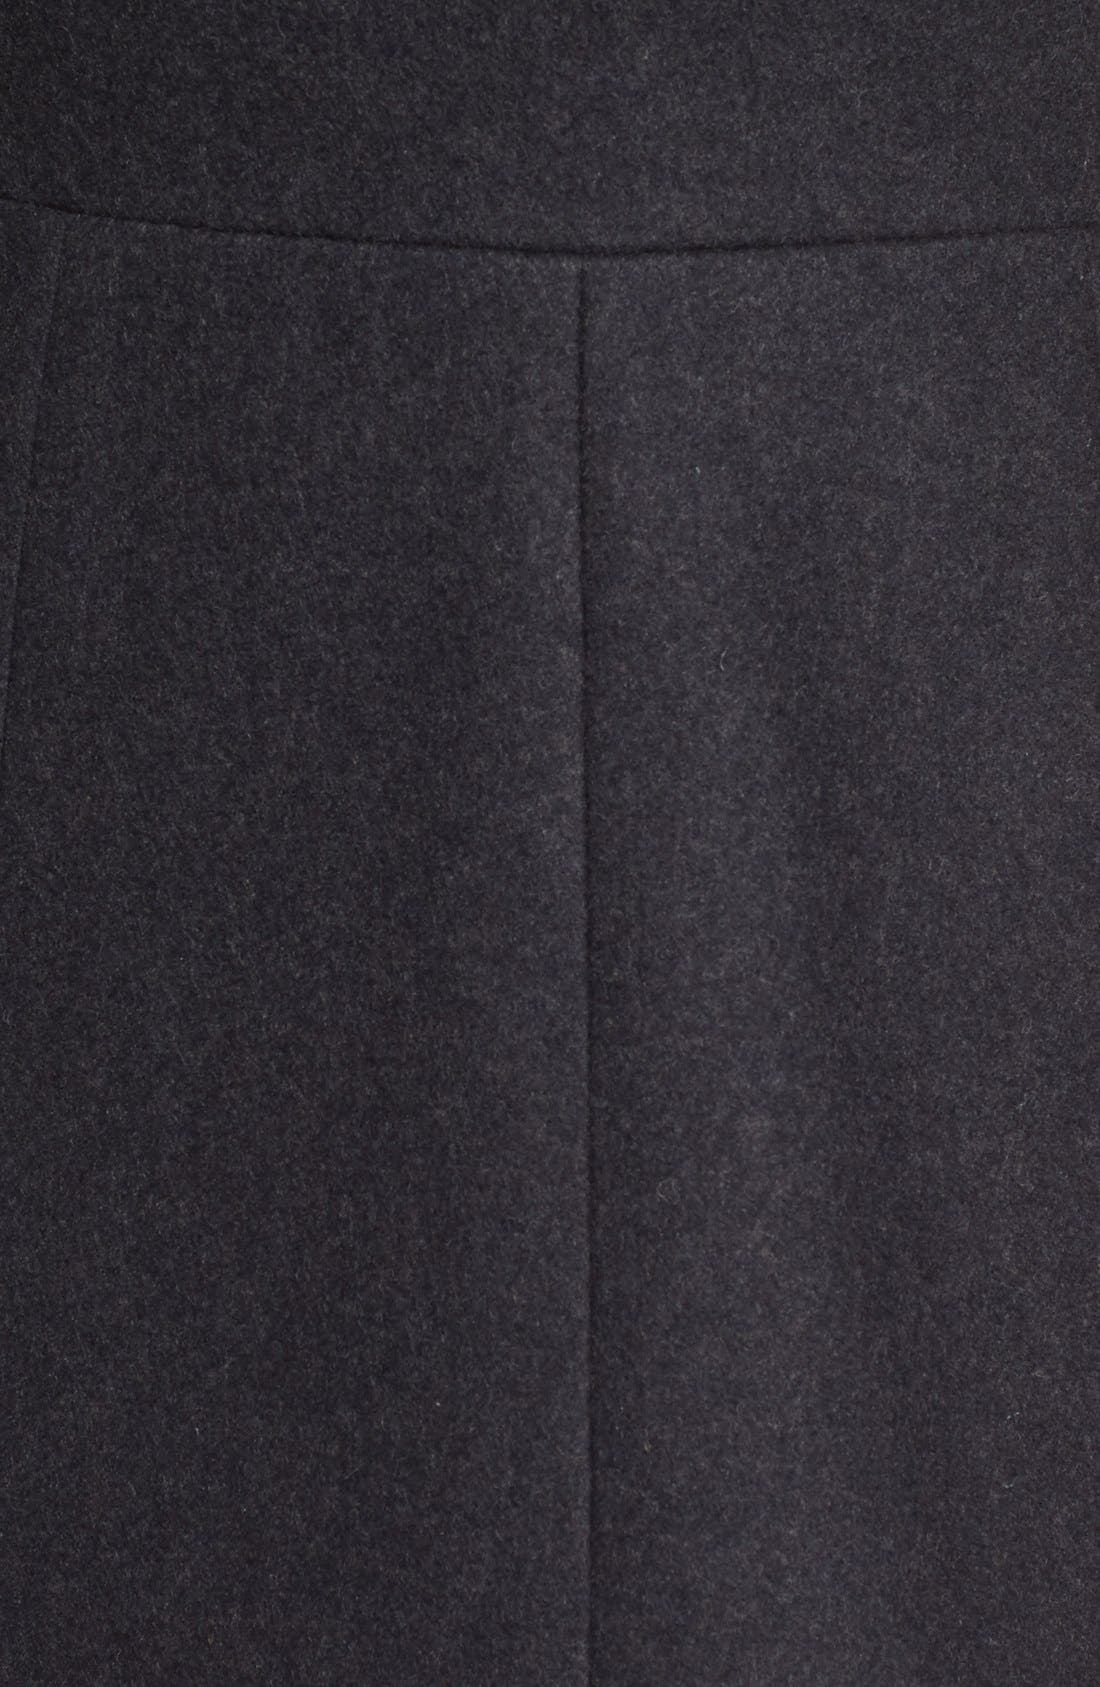 Wool Blend Hooded Coat,                             Alternate thumbnail 5, color,